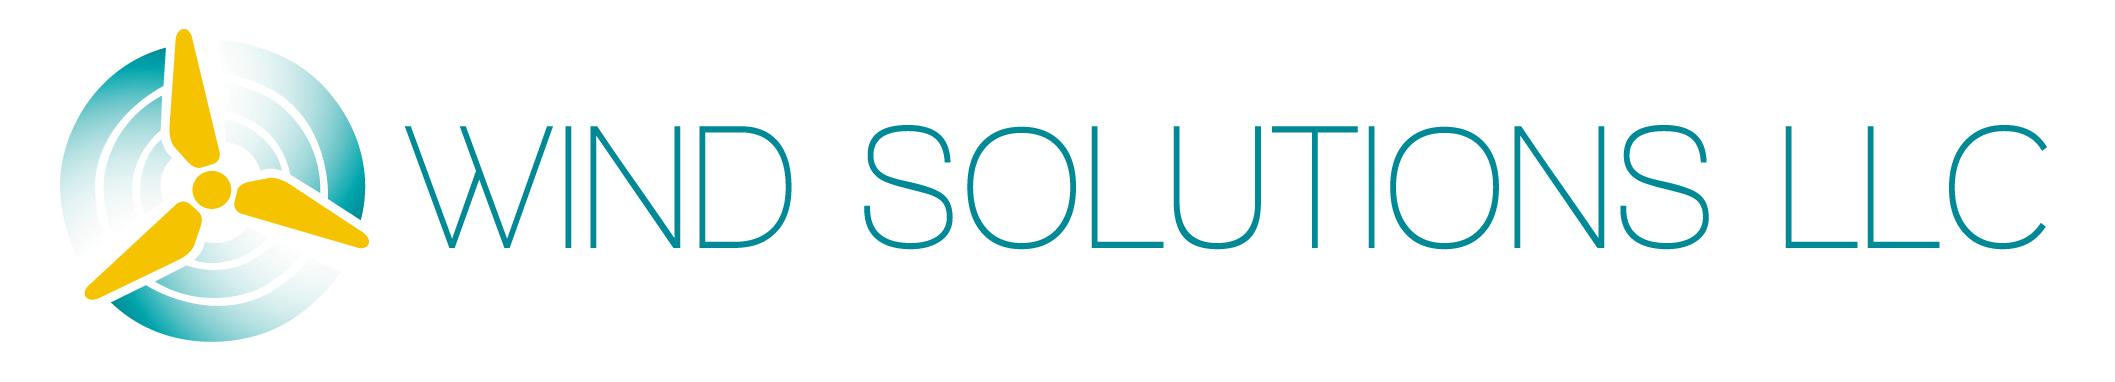 Wind Solutions, LLC